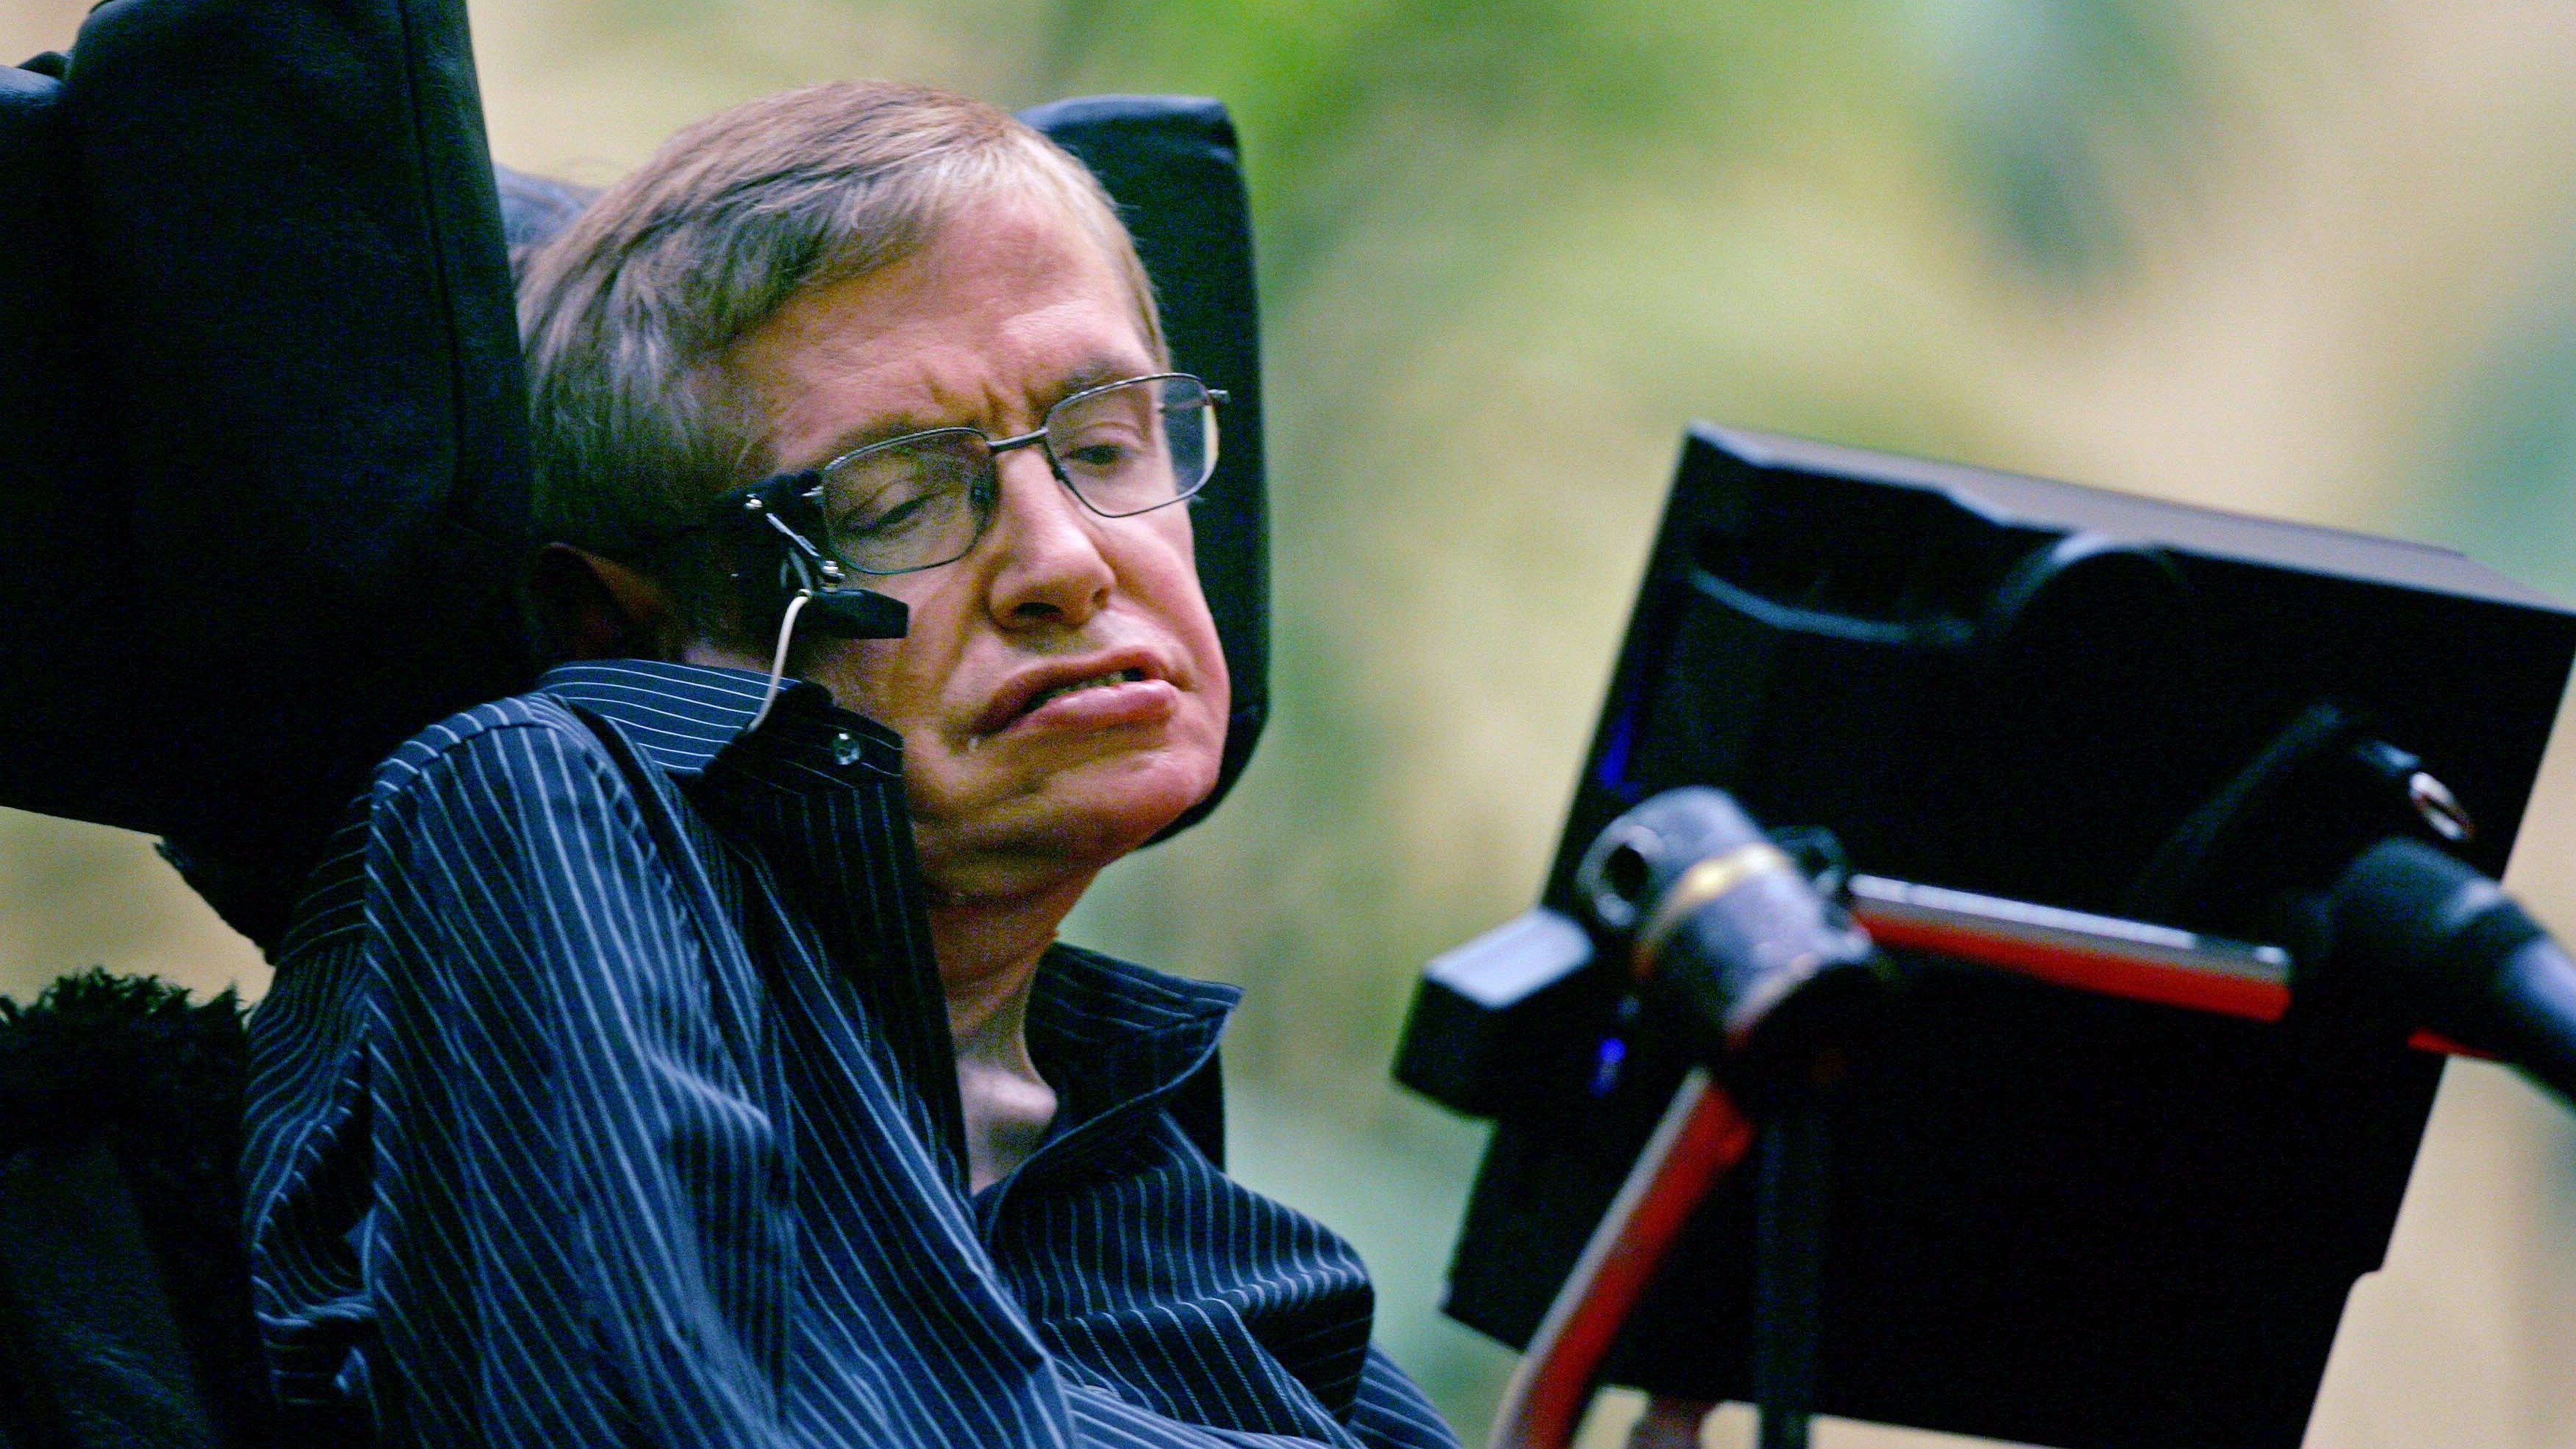 Stephen Hawking's Brave New World